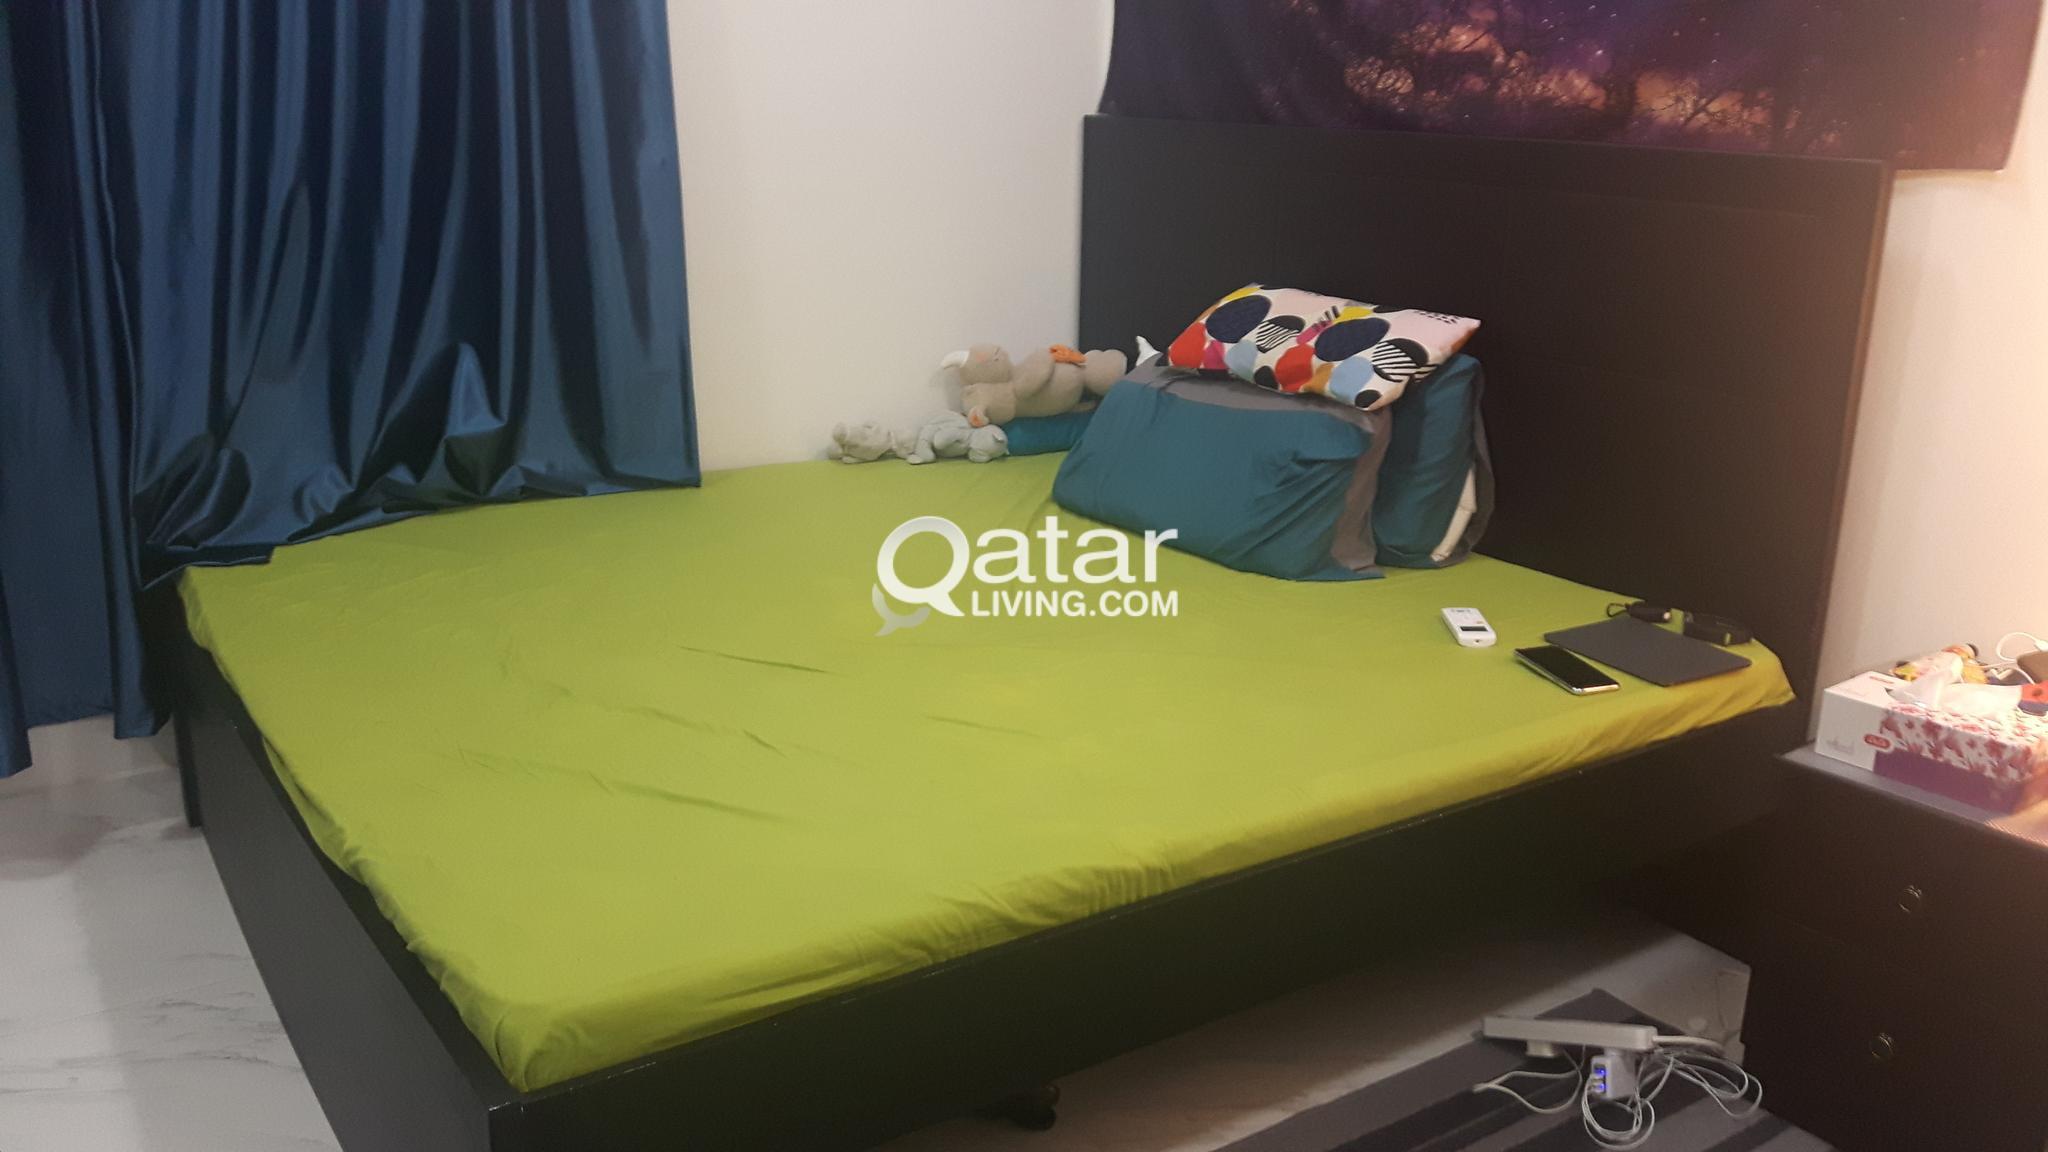 Queen size bed, mattress, drawers, dresser, cupboa